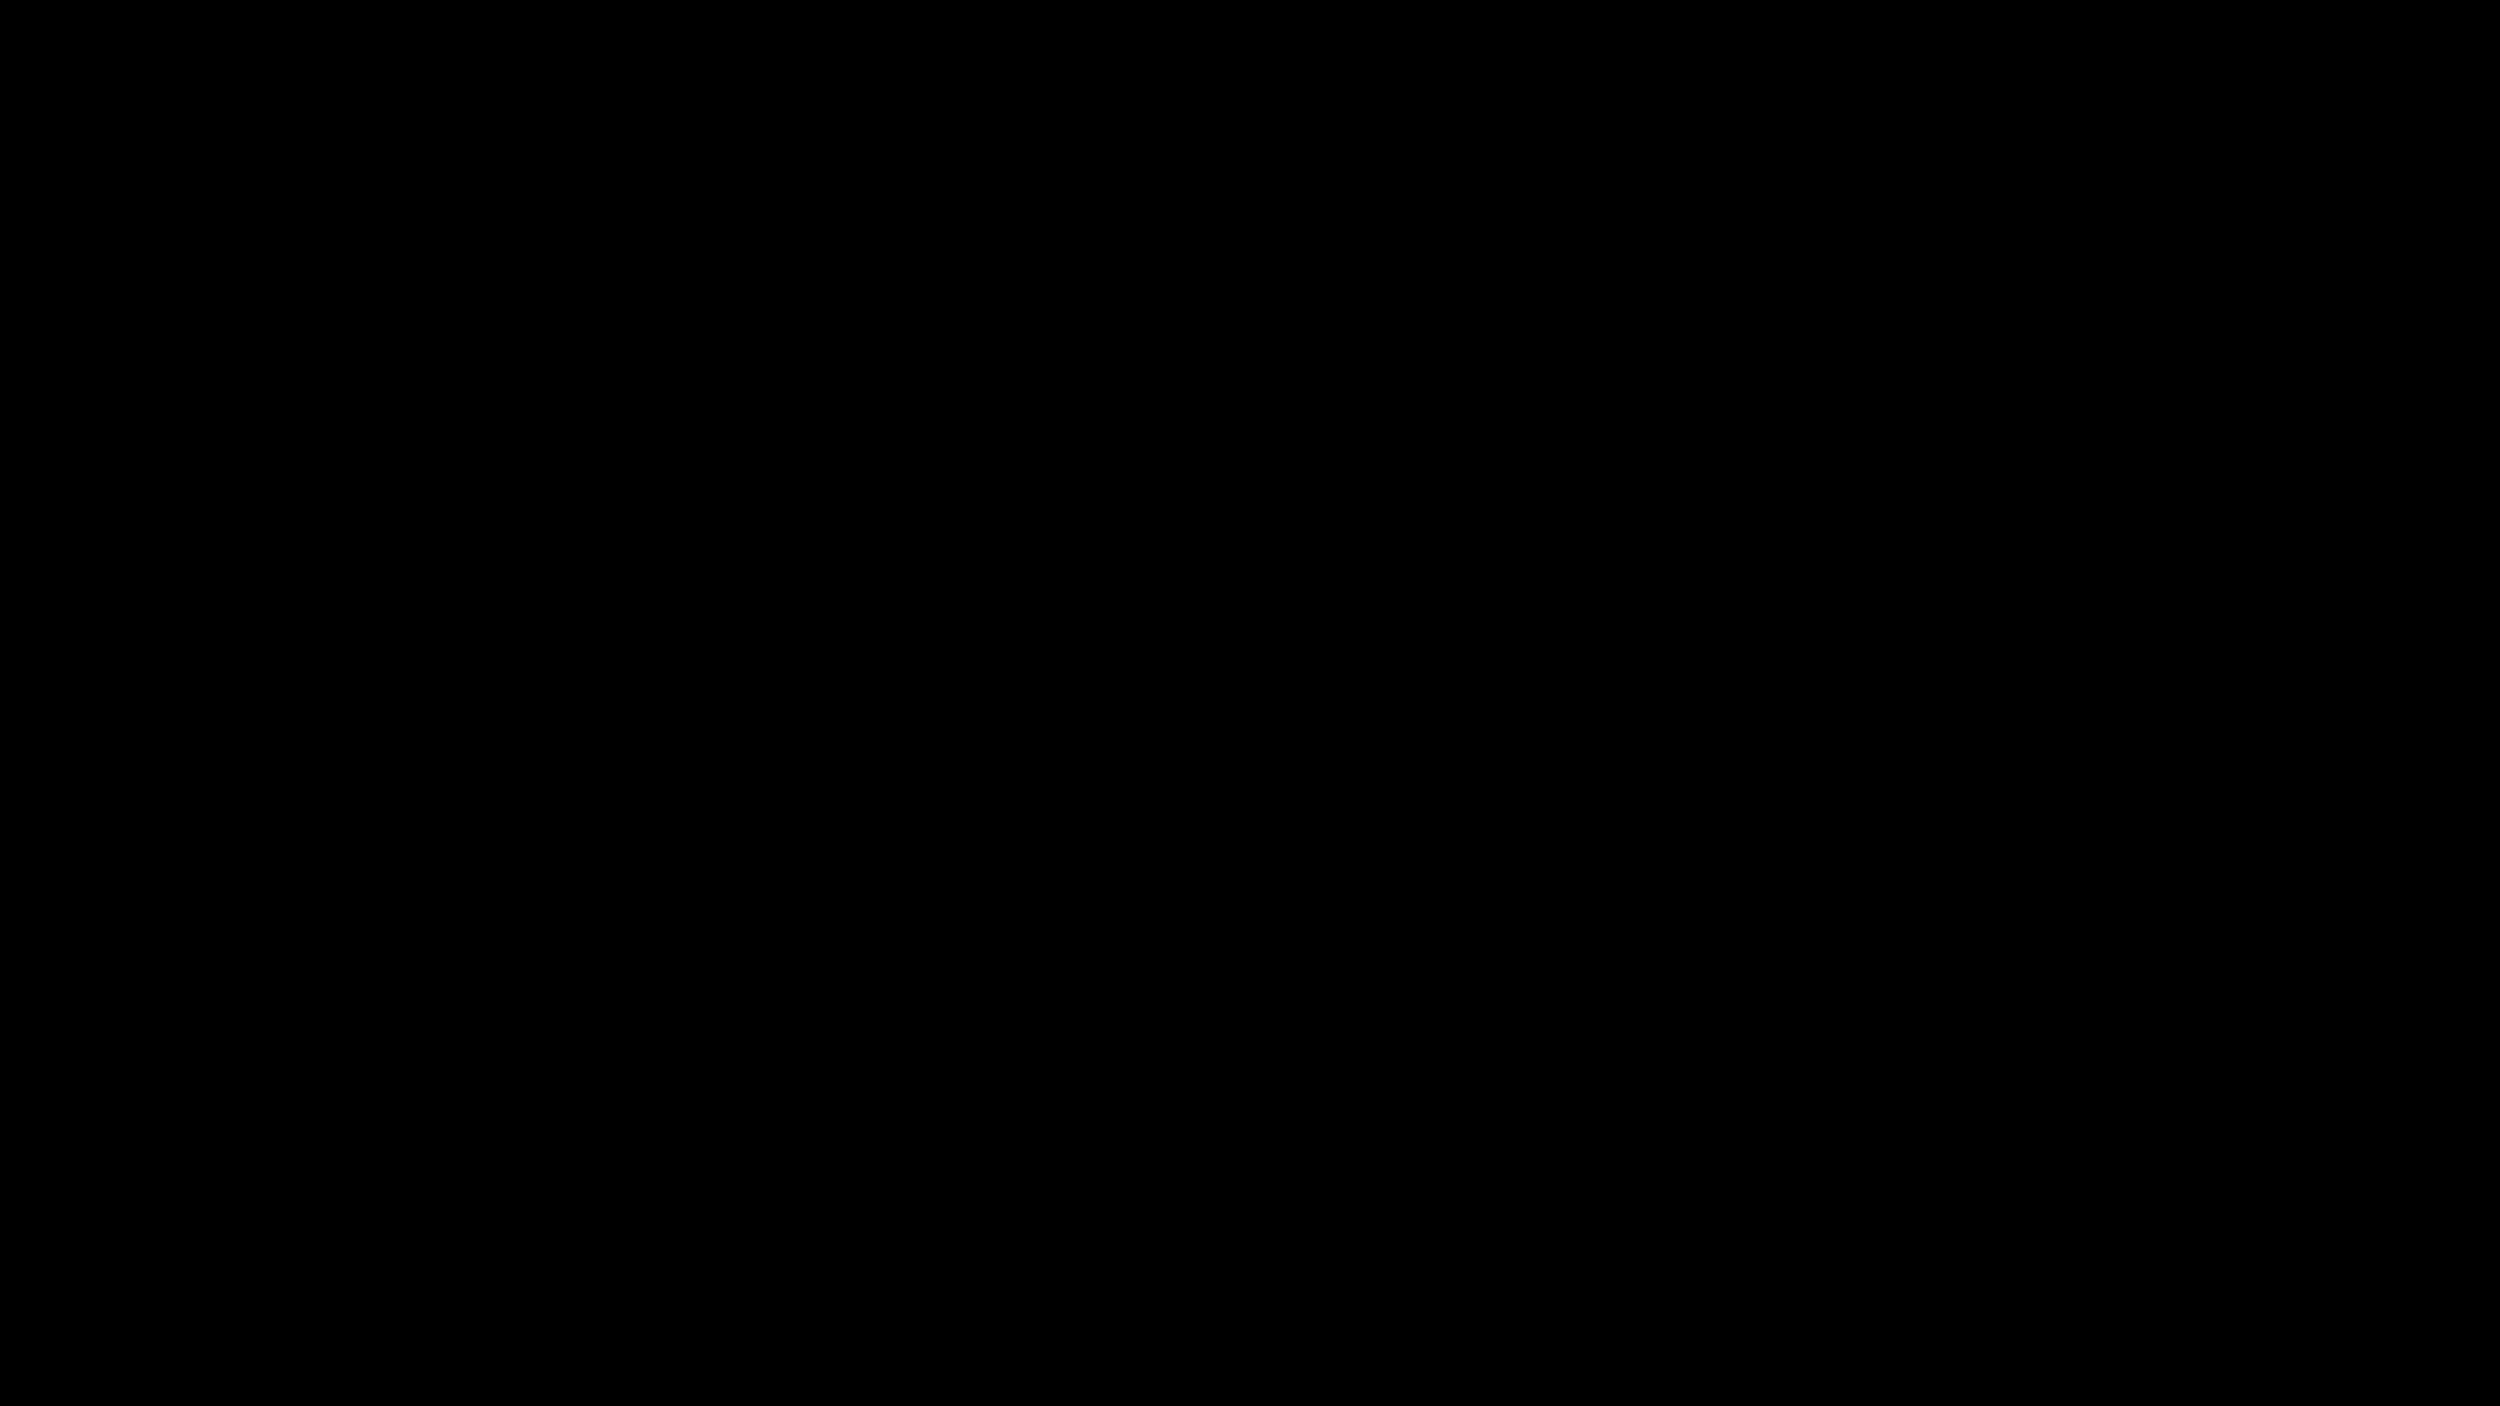 EMVoice_BlackLogoTransparent_1680px-02.png